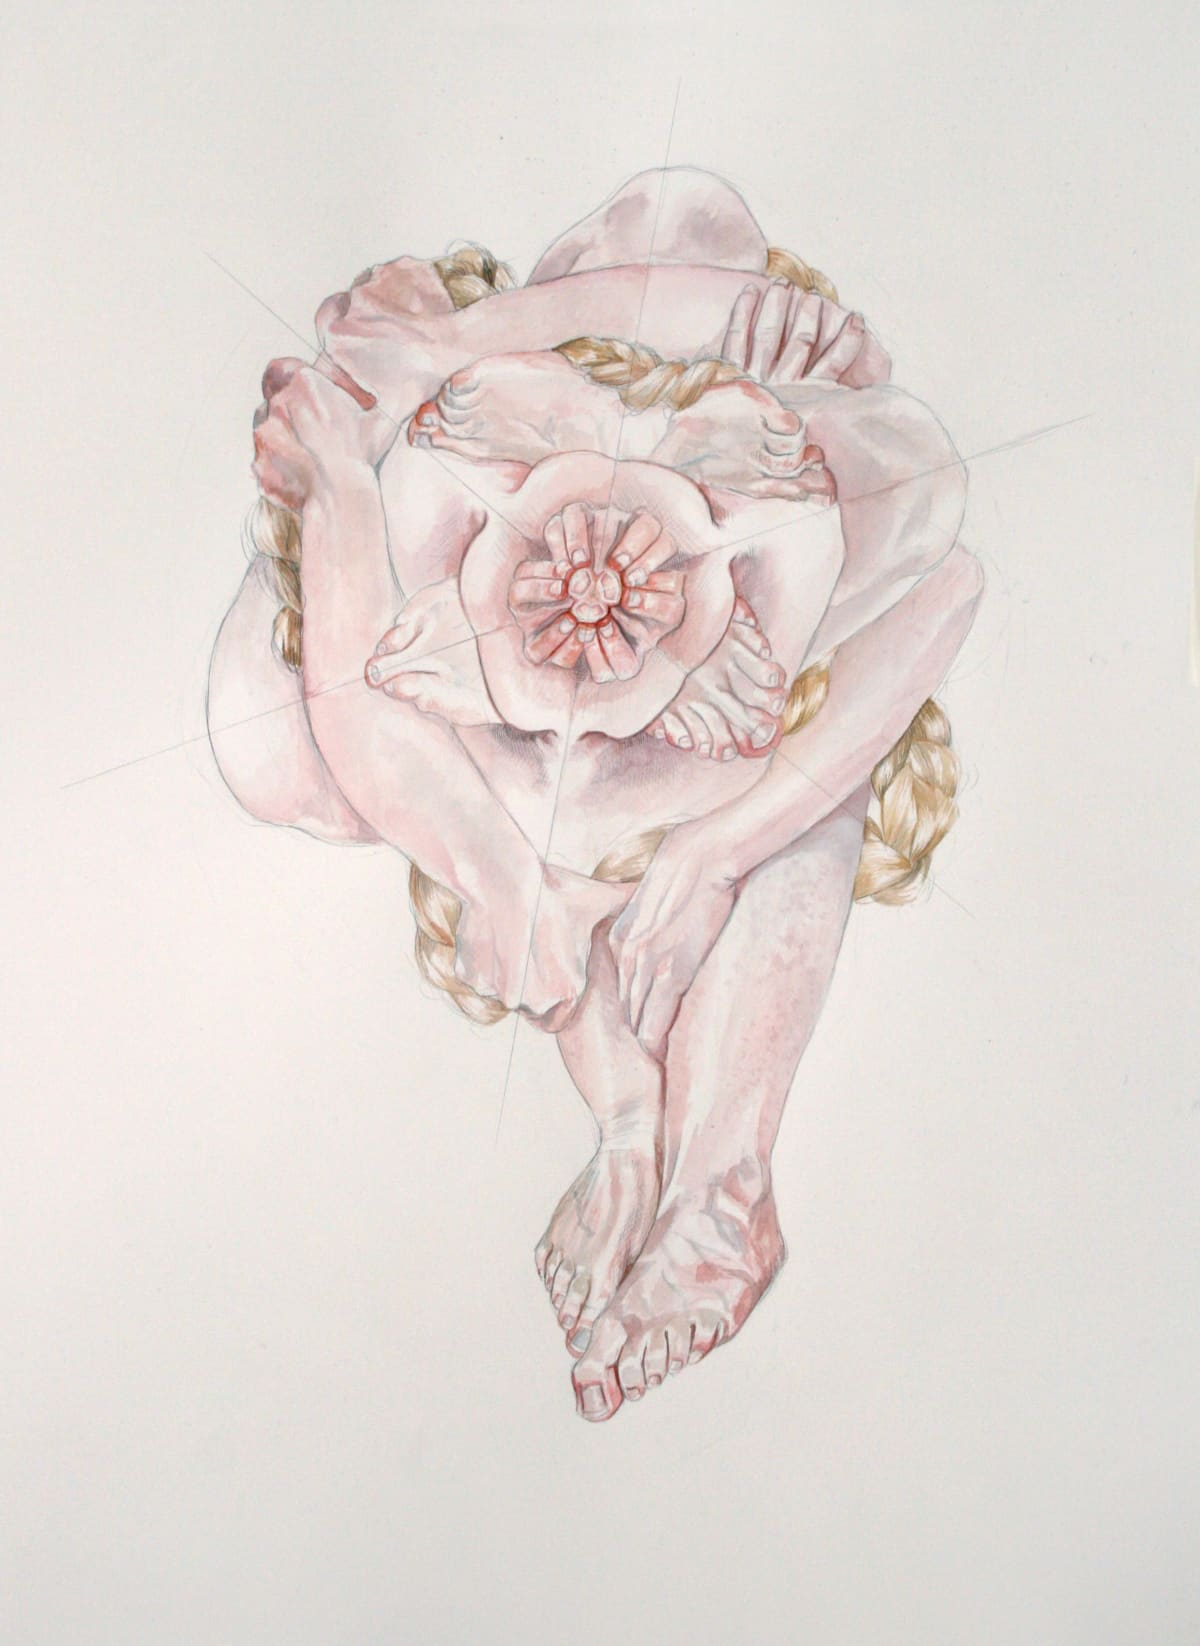 Vera Klute Bulk Pencil & watercolour on paper 70 x 55cm